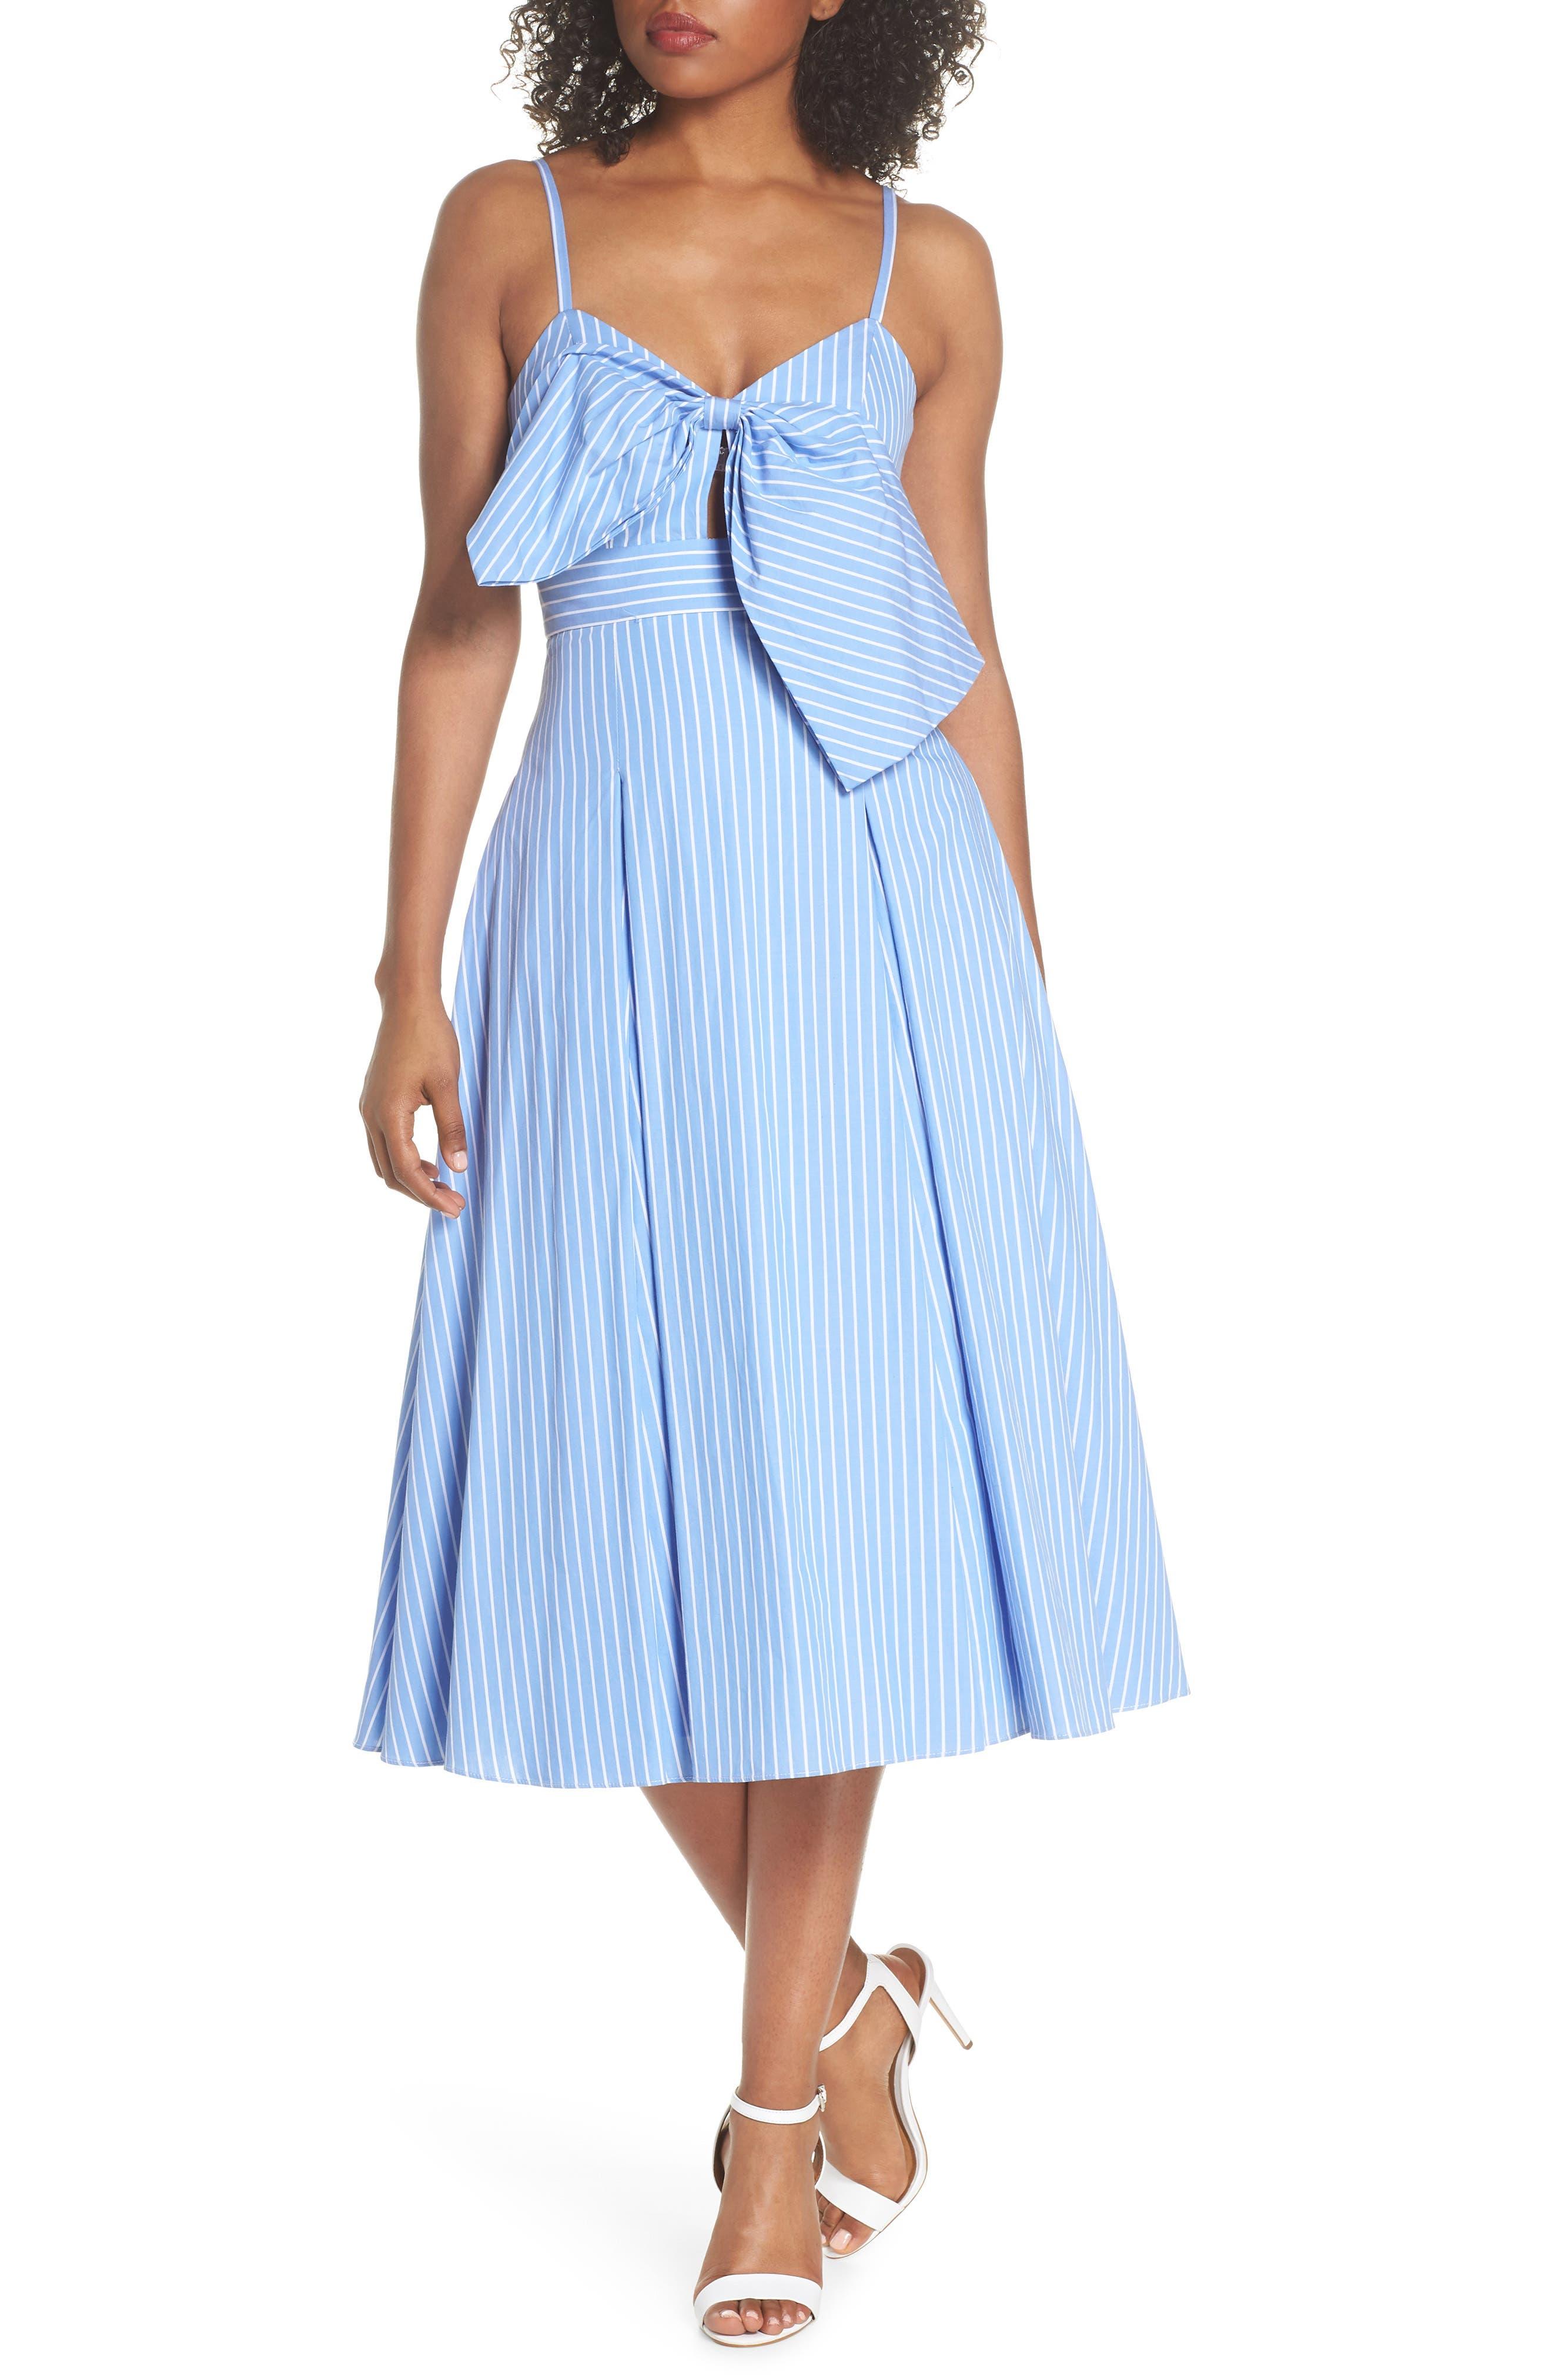 Becky Bow Front Tea Length Dress,                             Main thumbnail 1, color,                             Pale Blue/ White Stripe